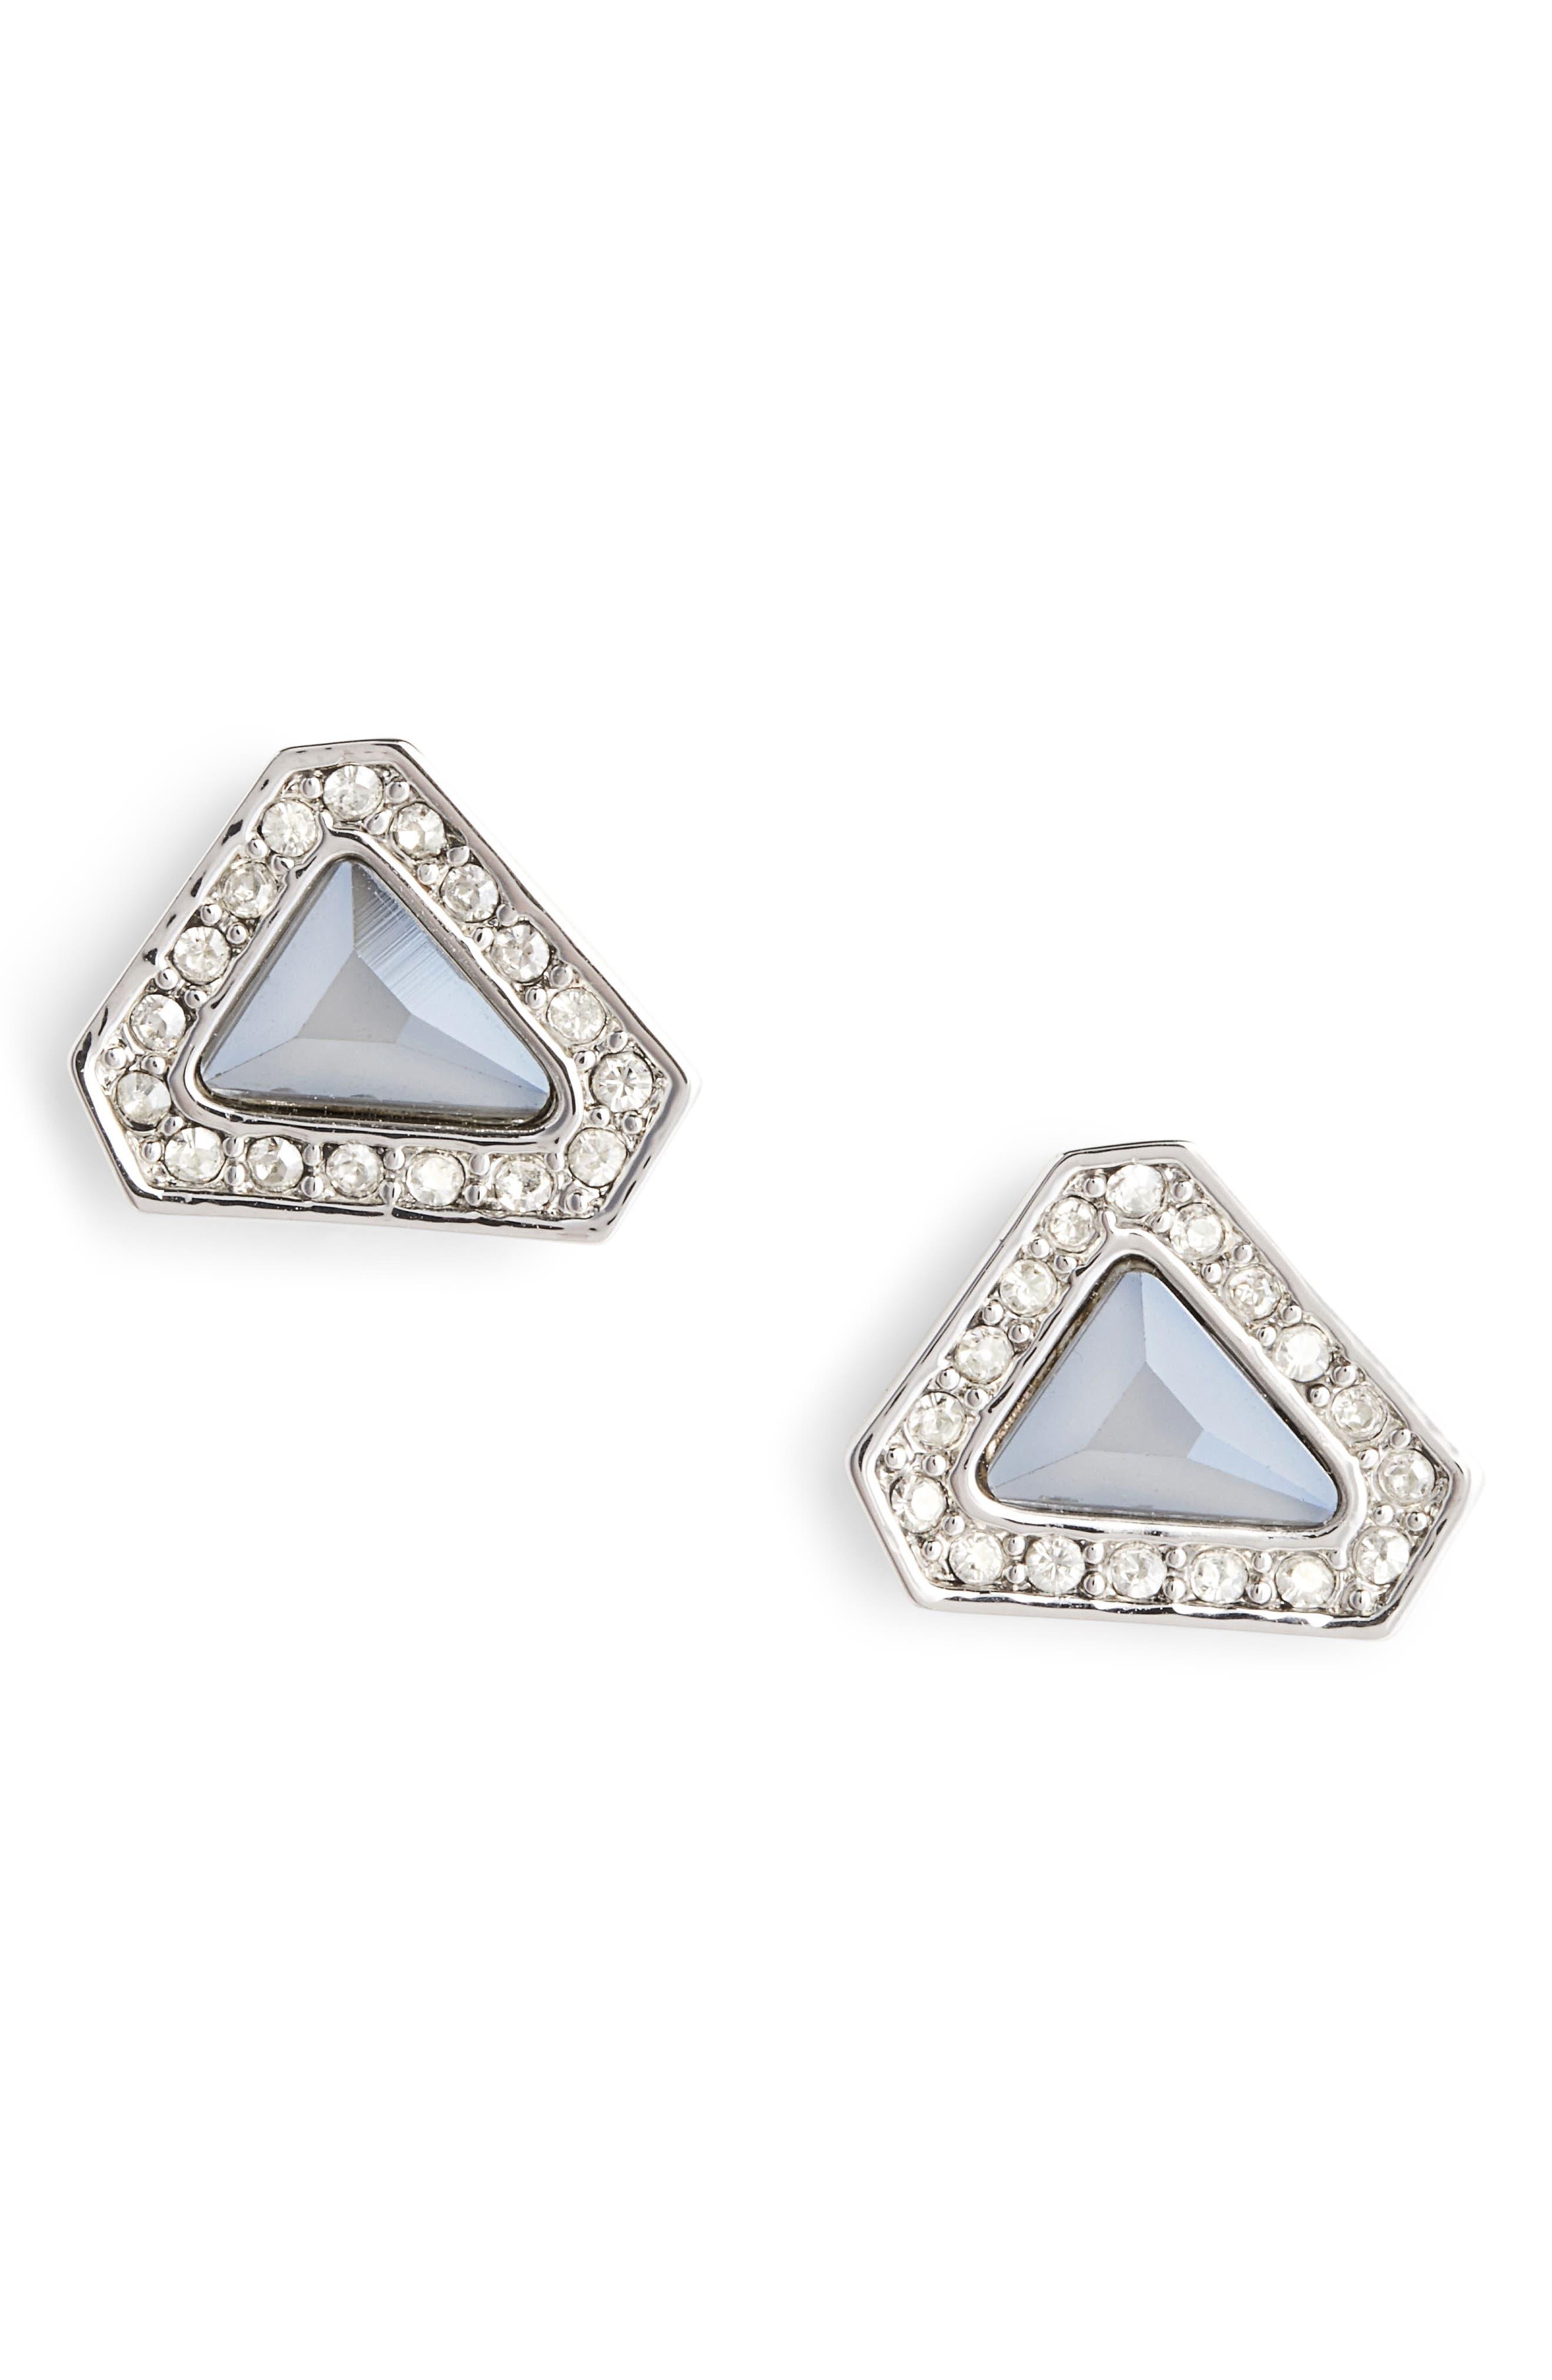 Main Image - St. John Collection Swarovski Crystal Stud Earrings